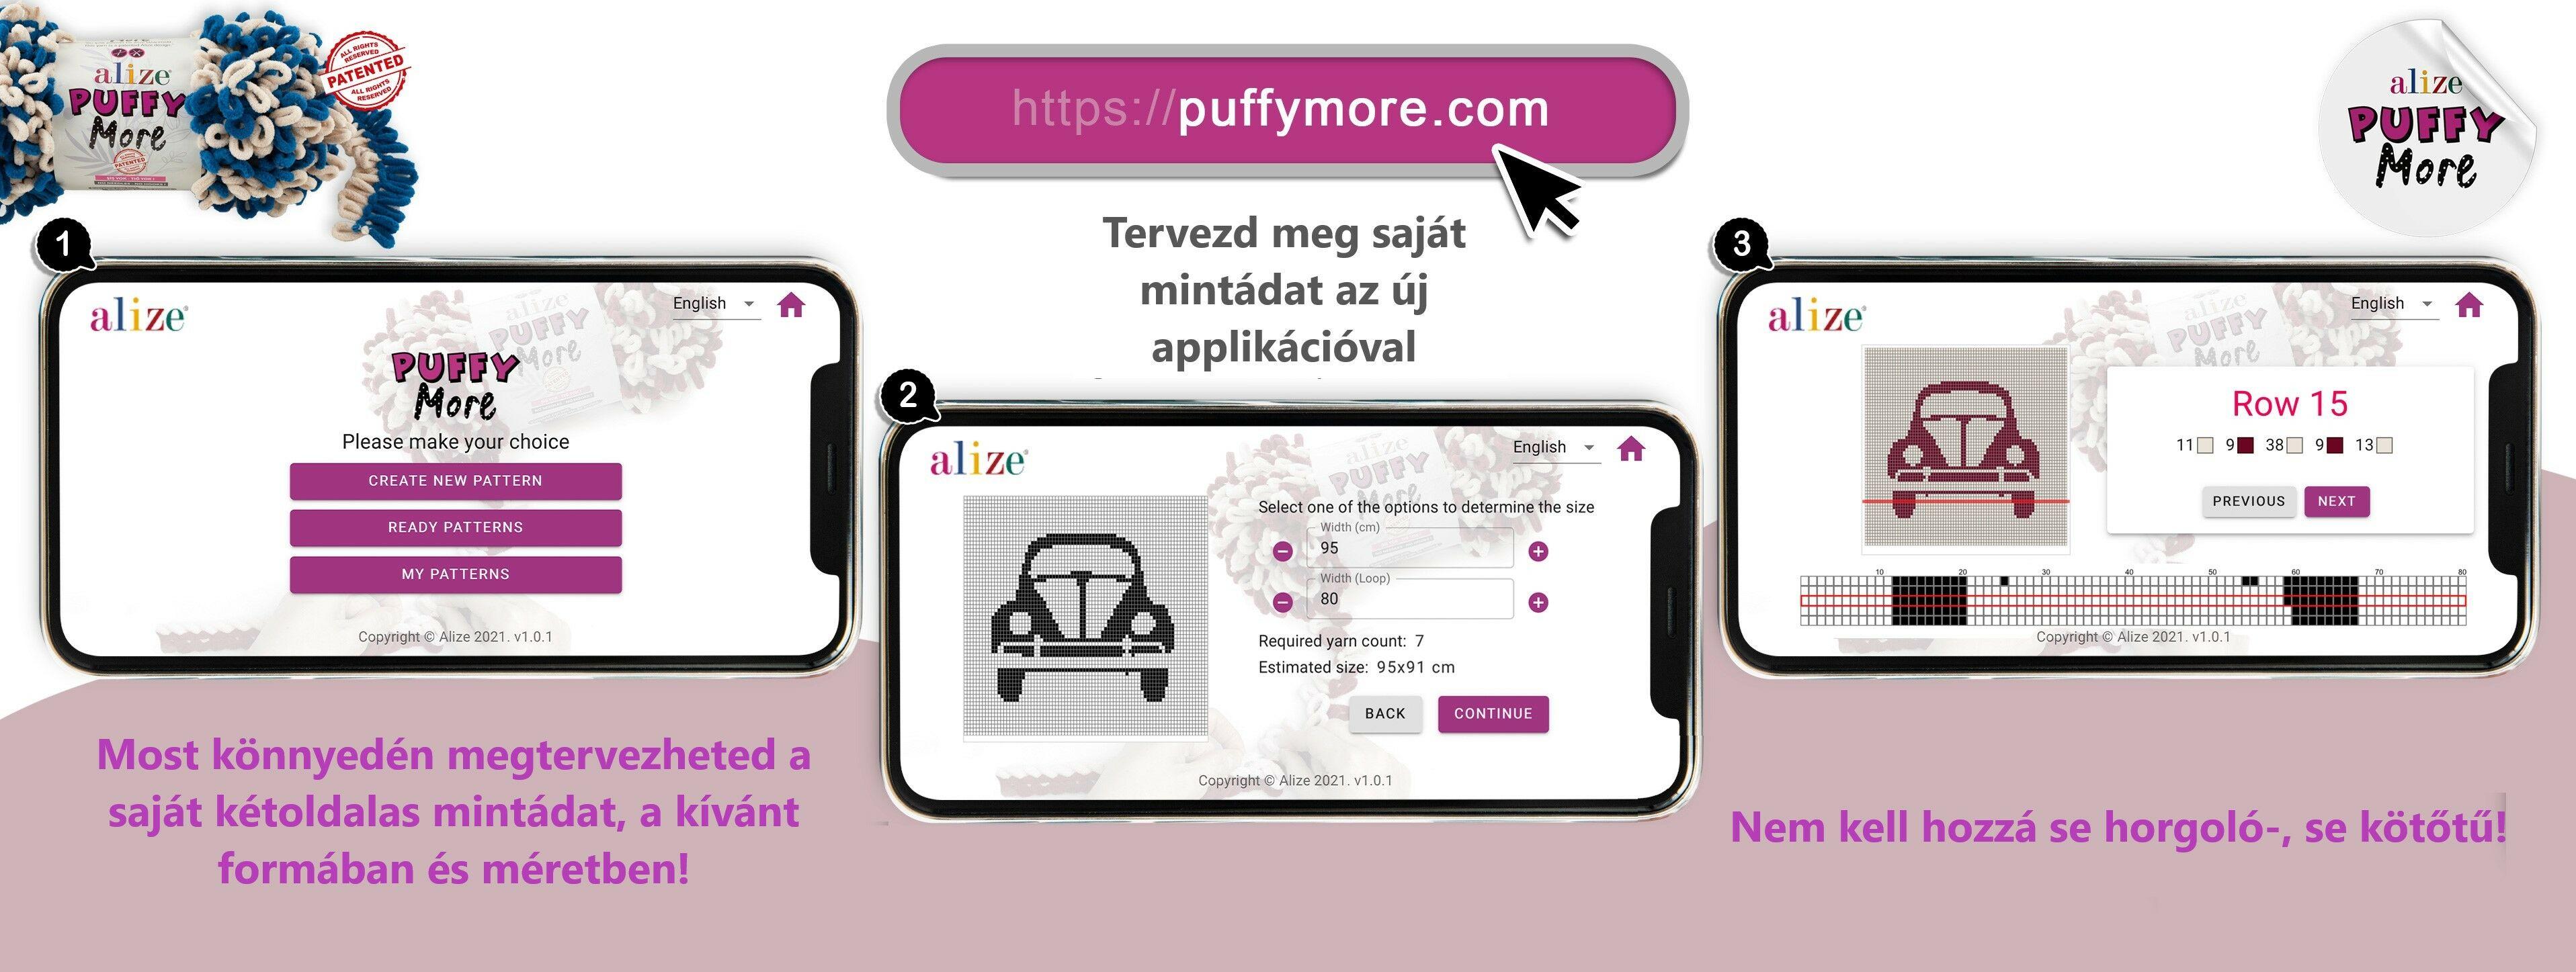 More_applik